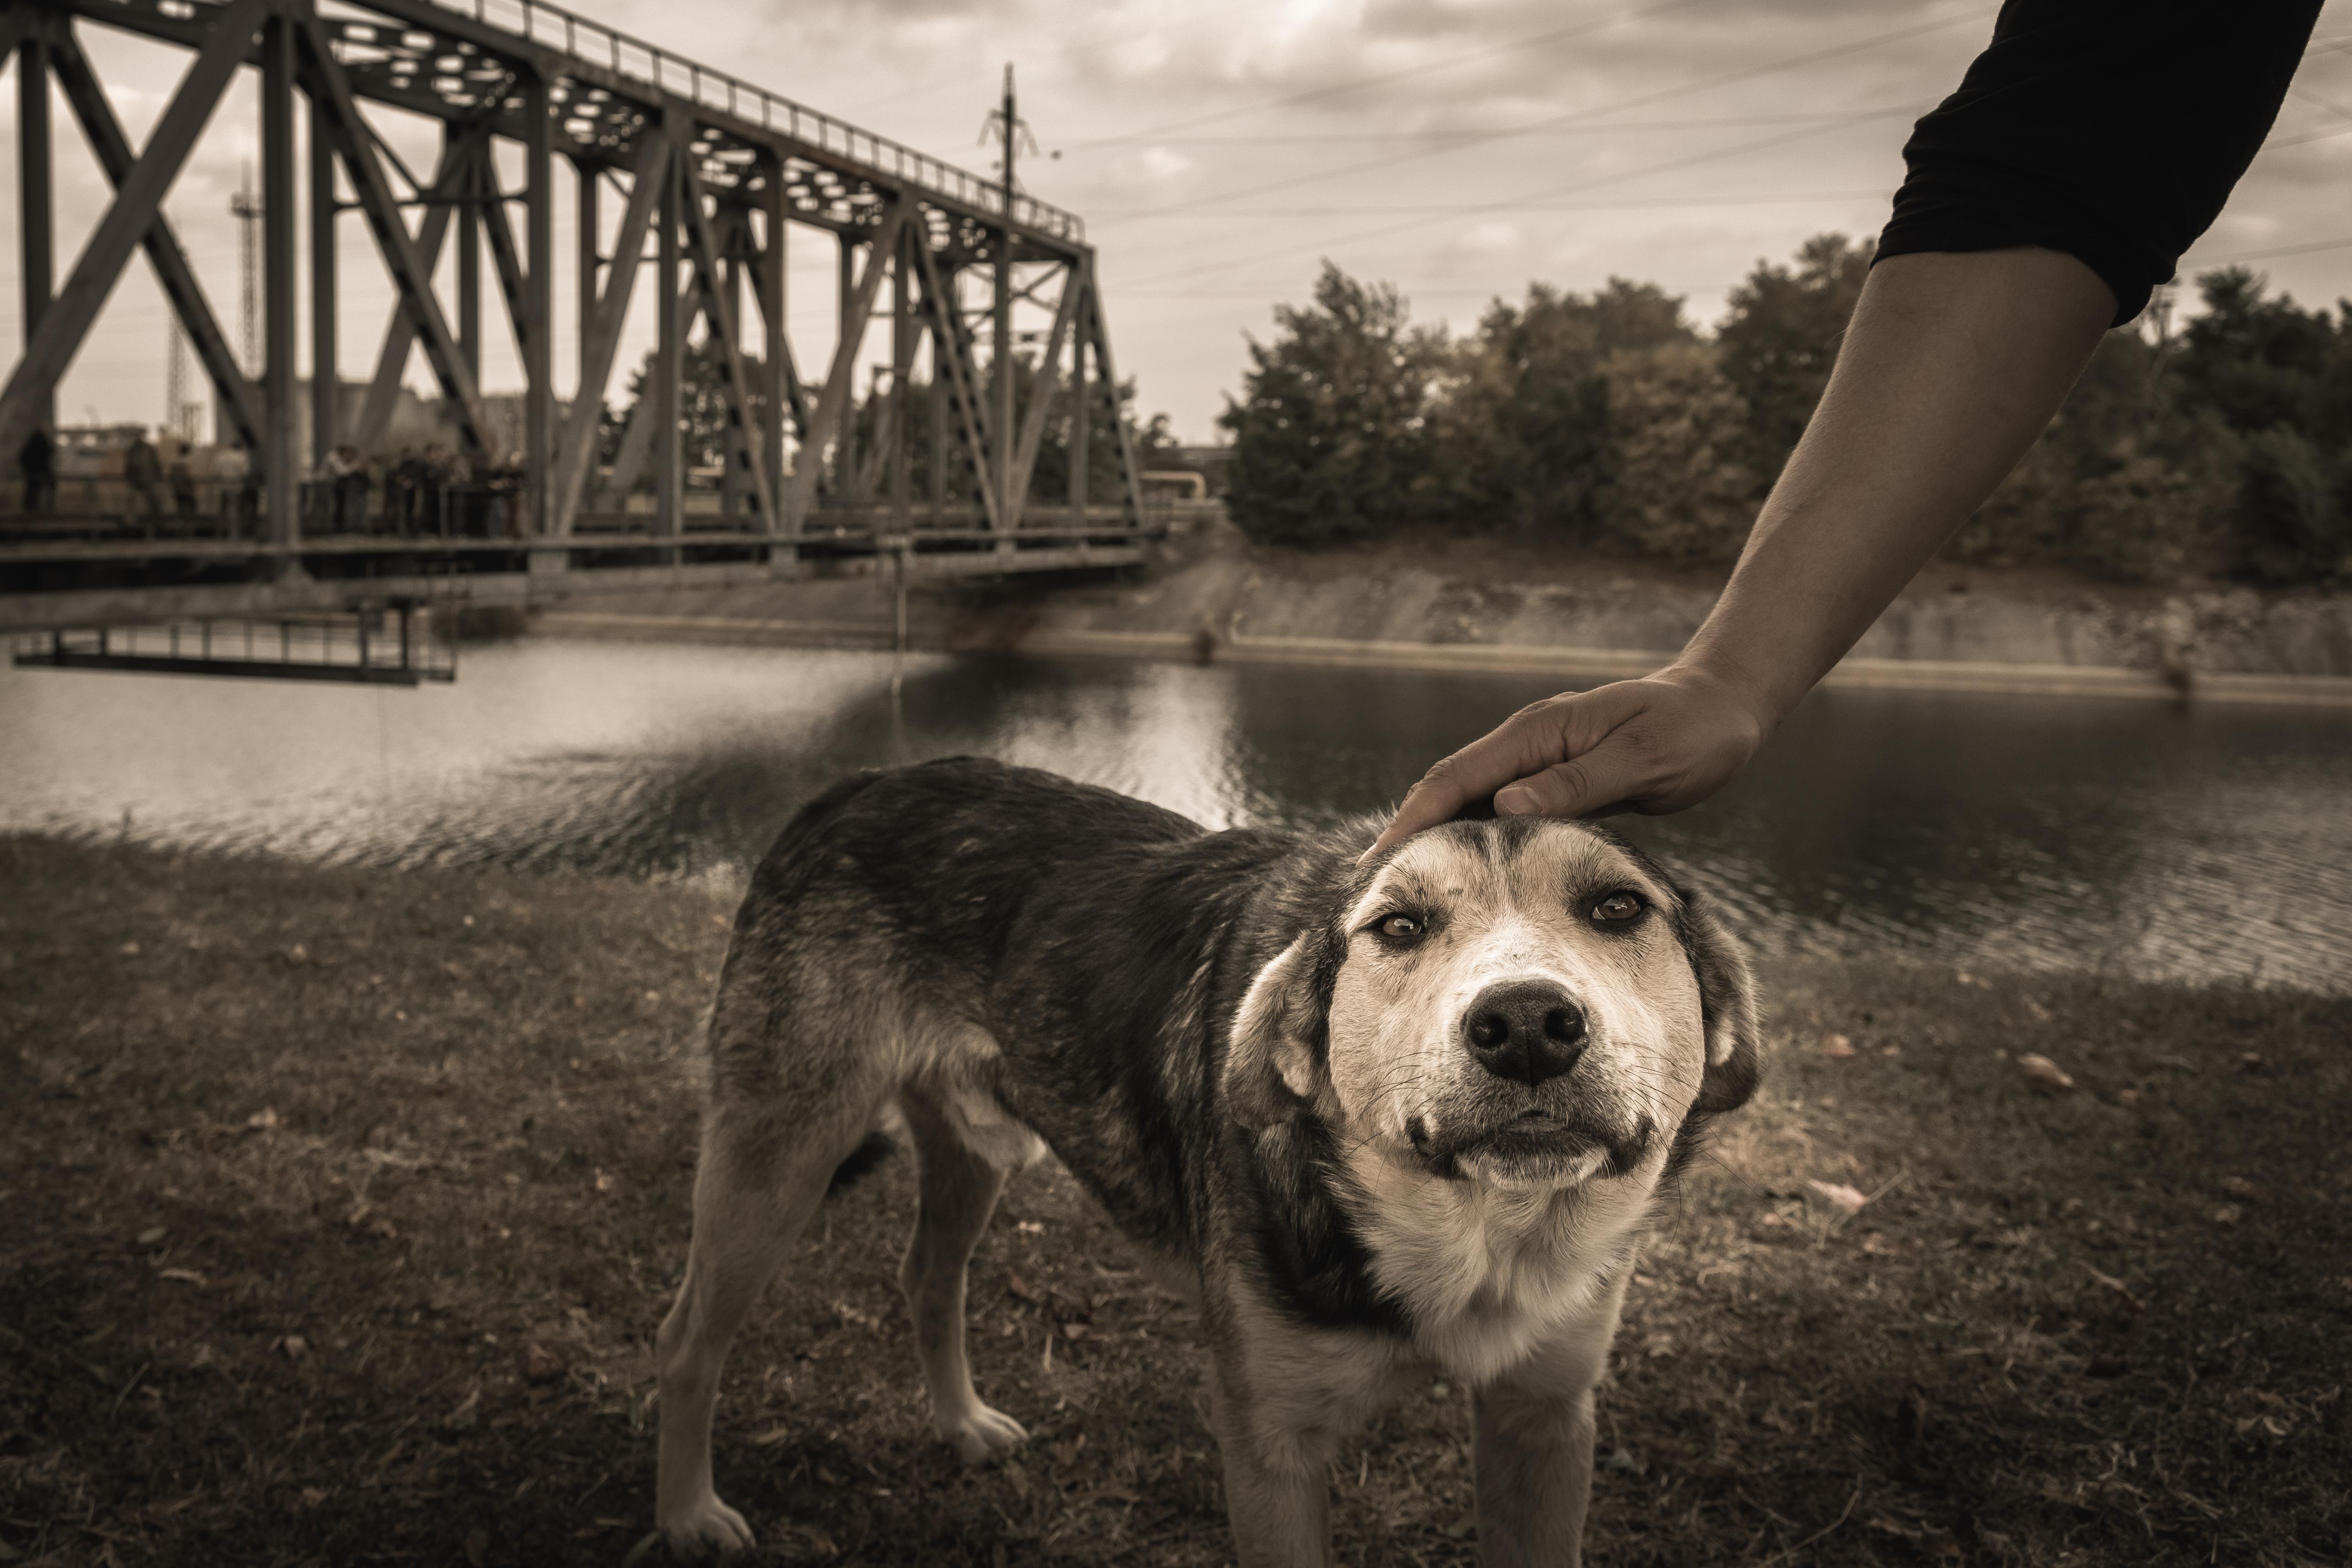 Image Credits: Shutterstock